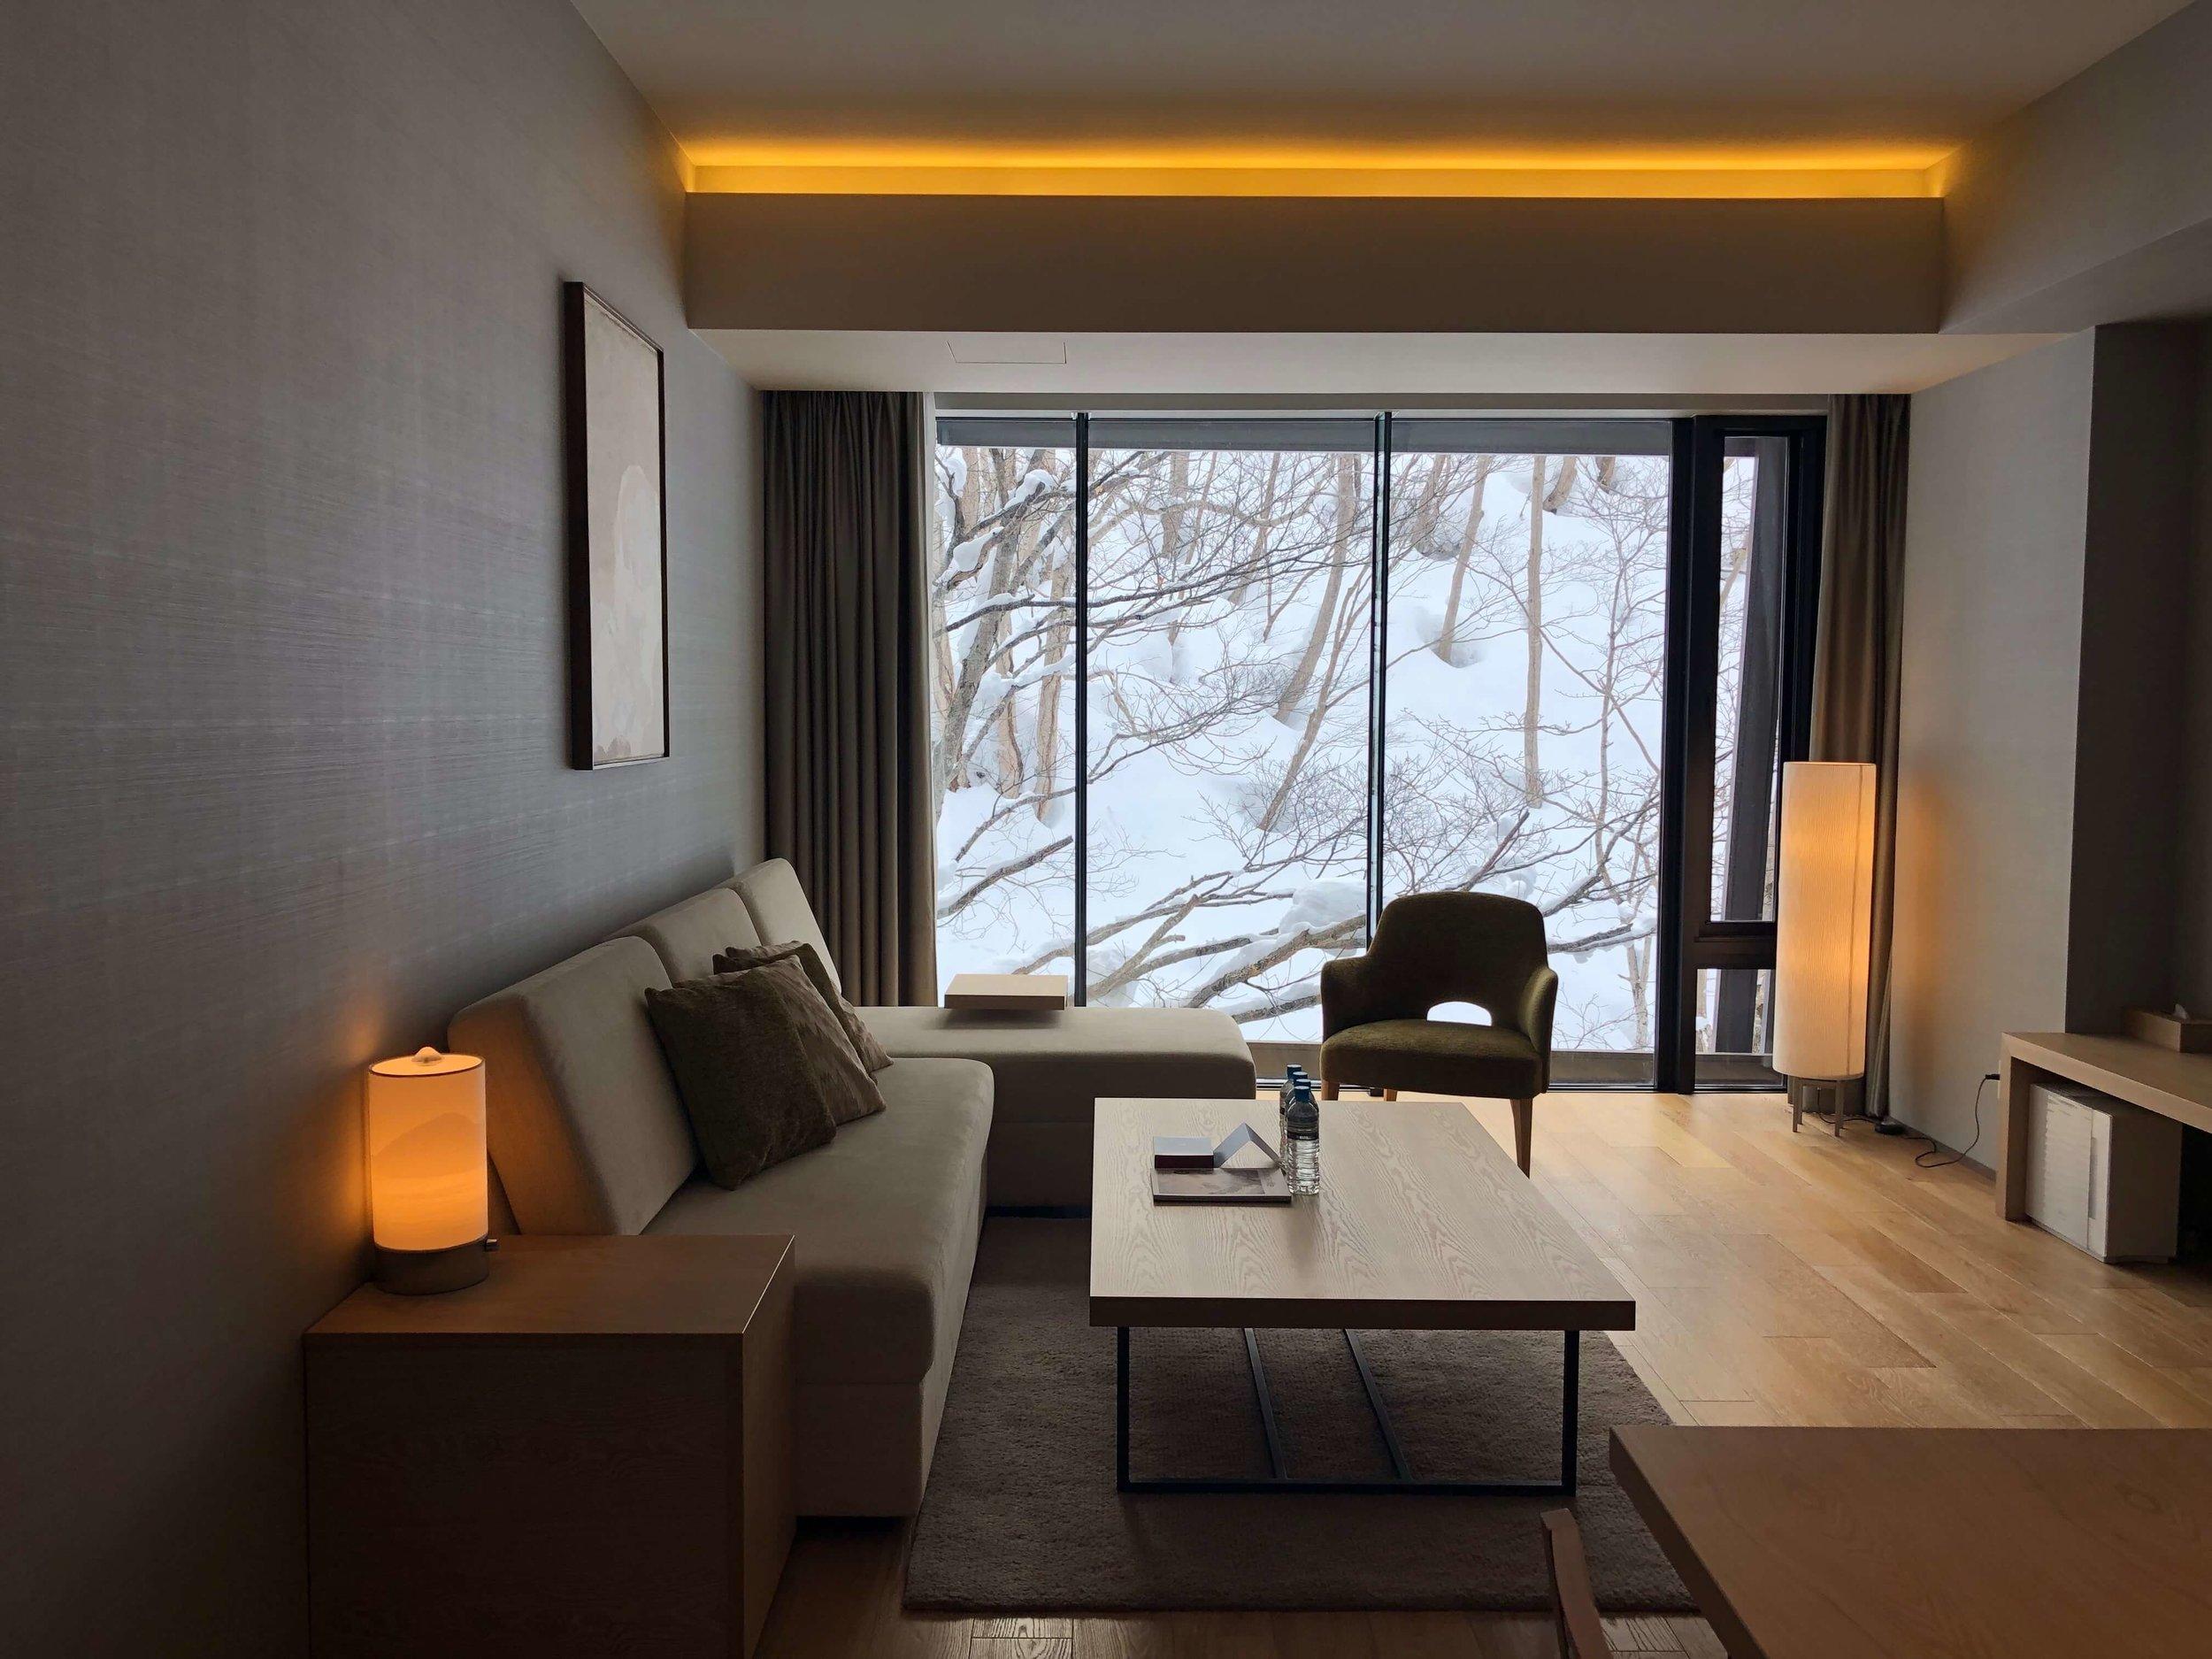 AYA Niseko Review - Luxury Ski Resort in Niseko, Japan | travelhappy blog